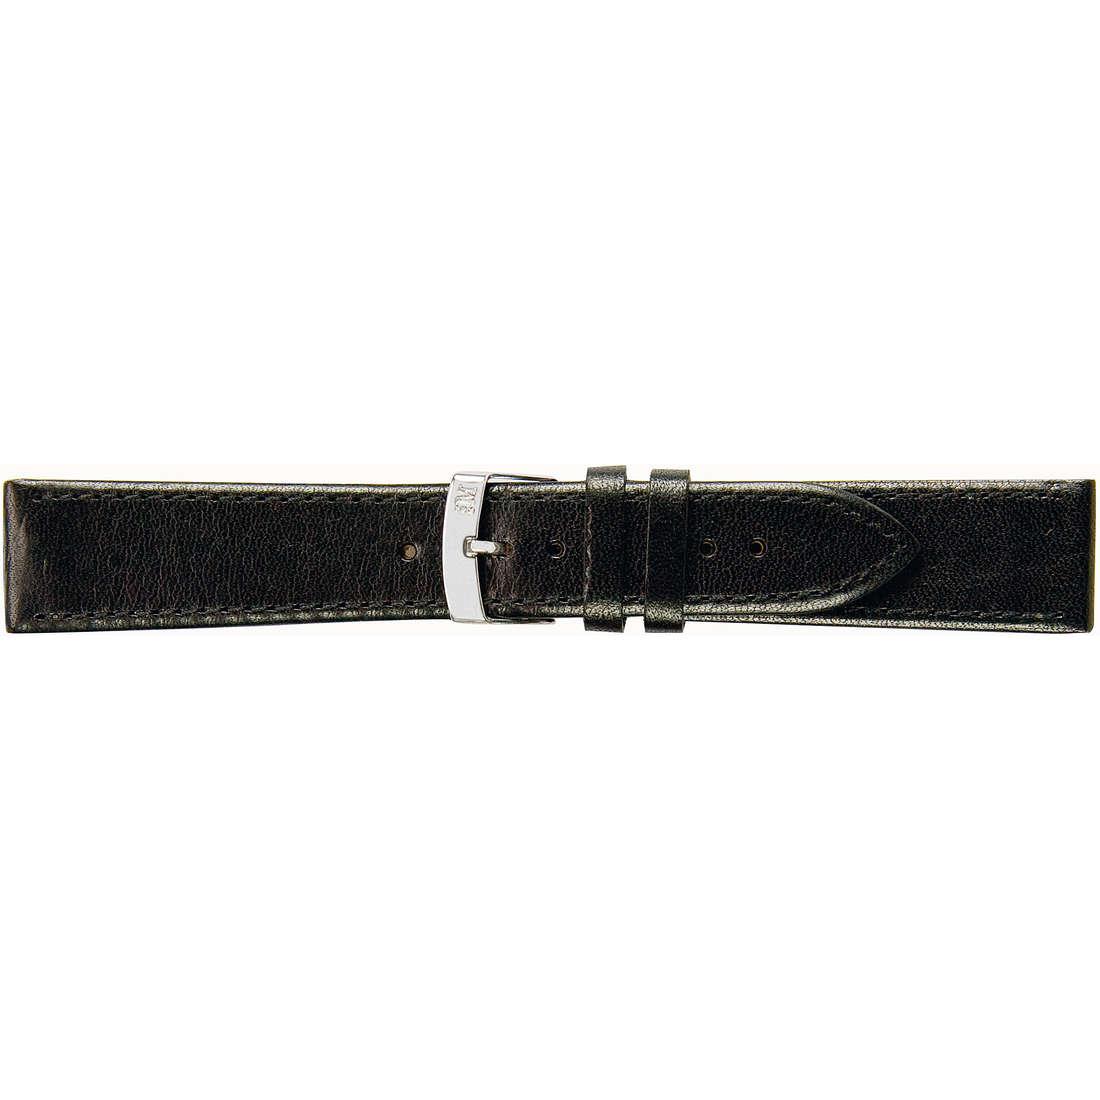 watch watch bands watch straps man Morellato Performance A01X3425695019CR18